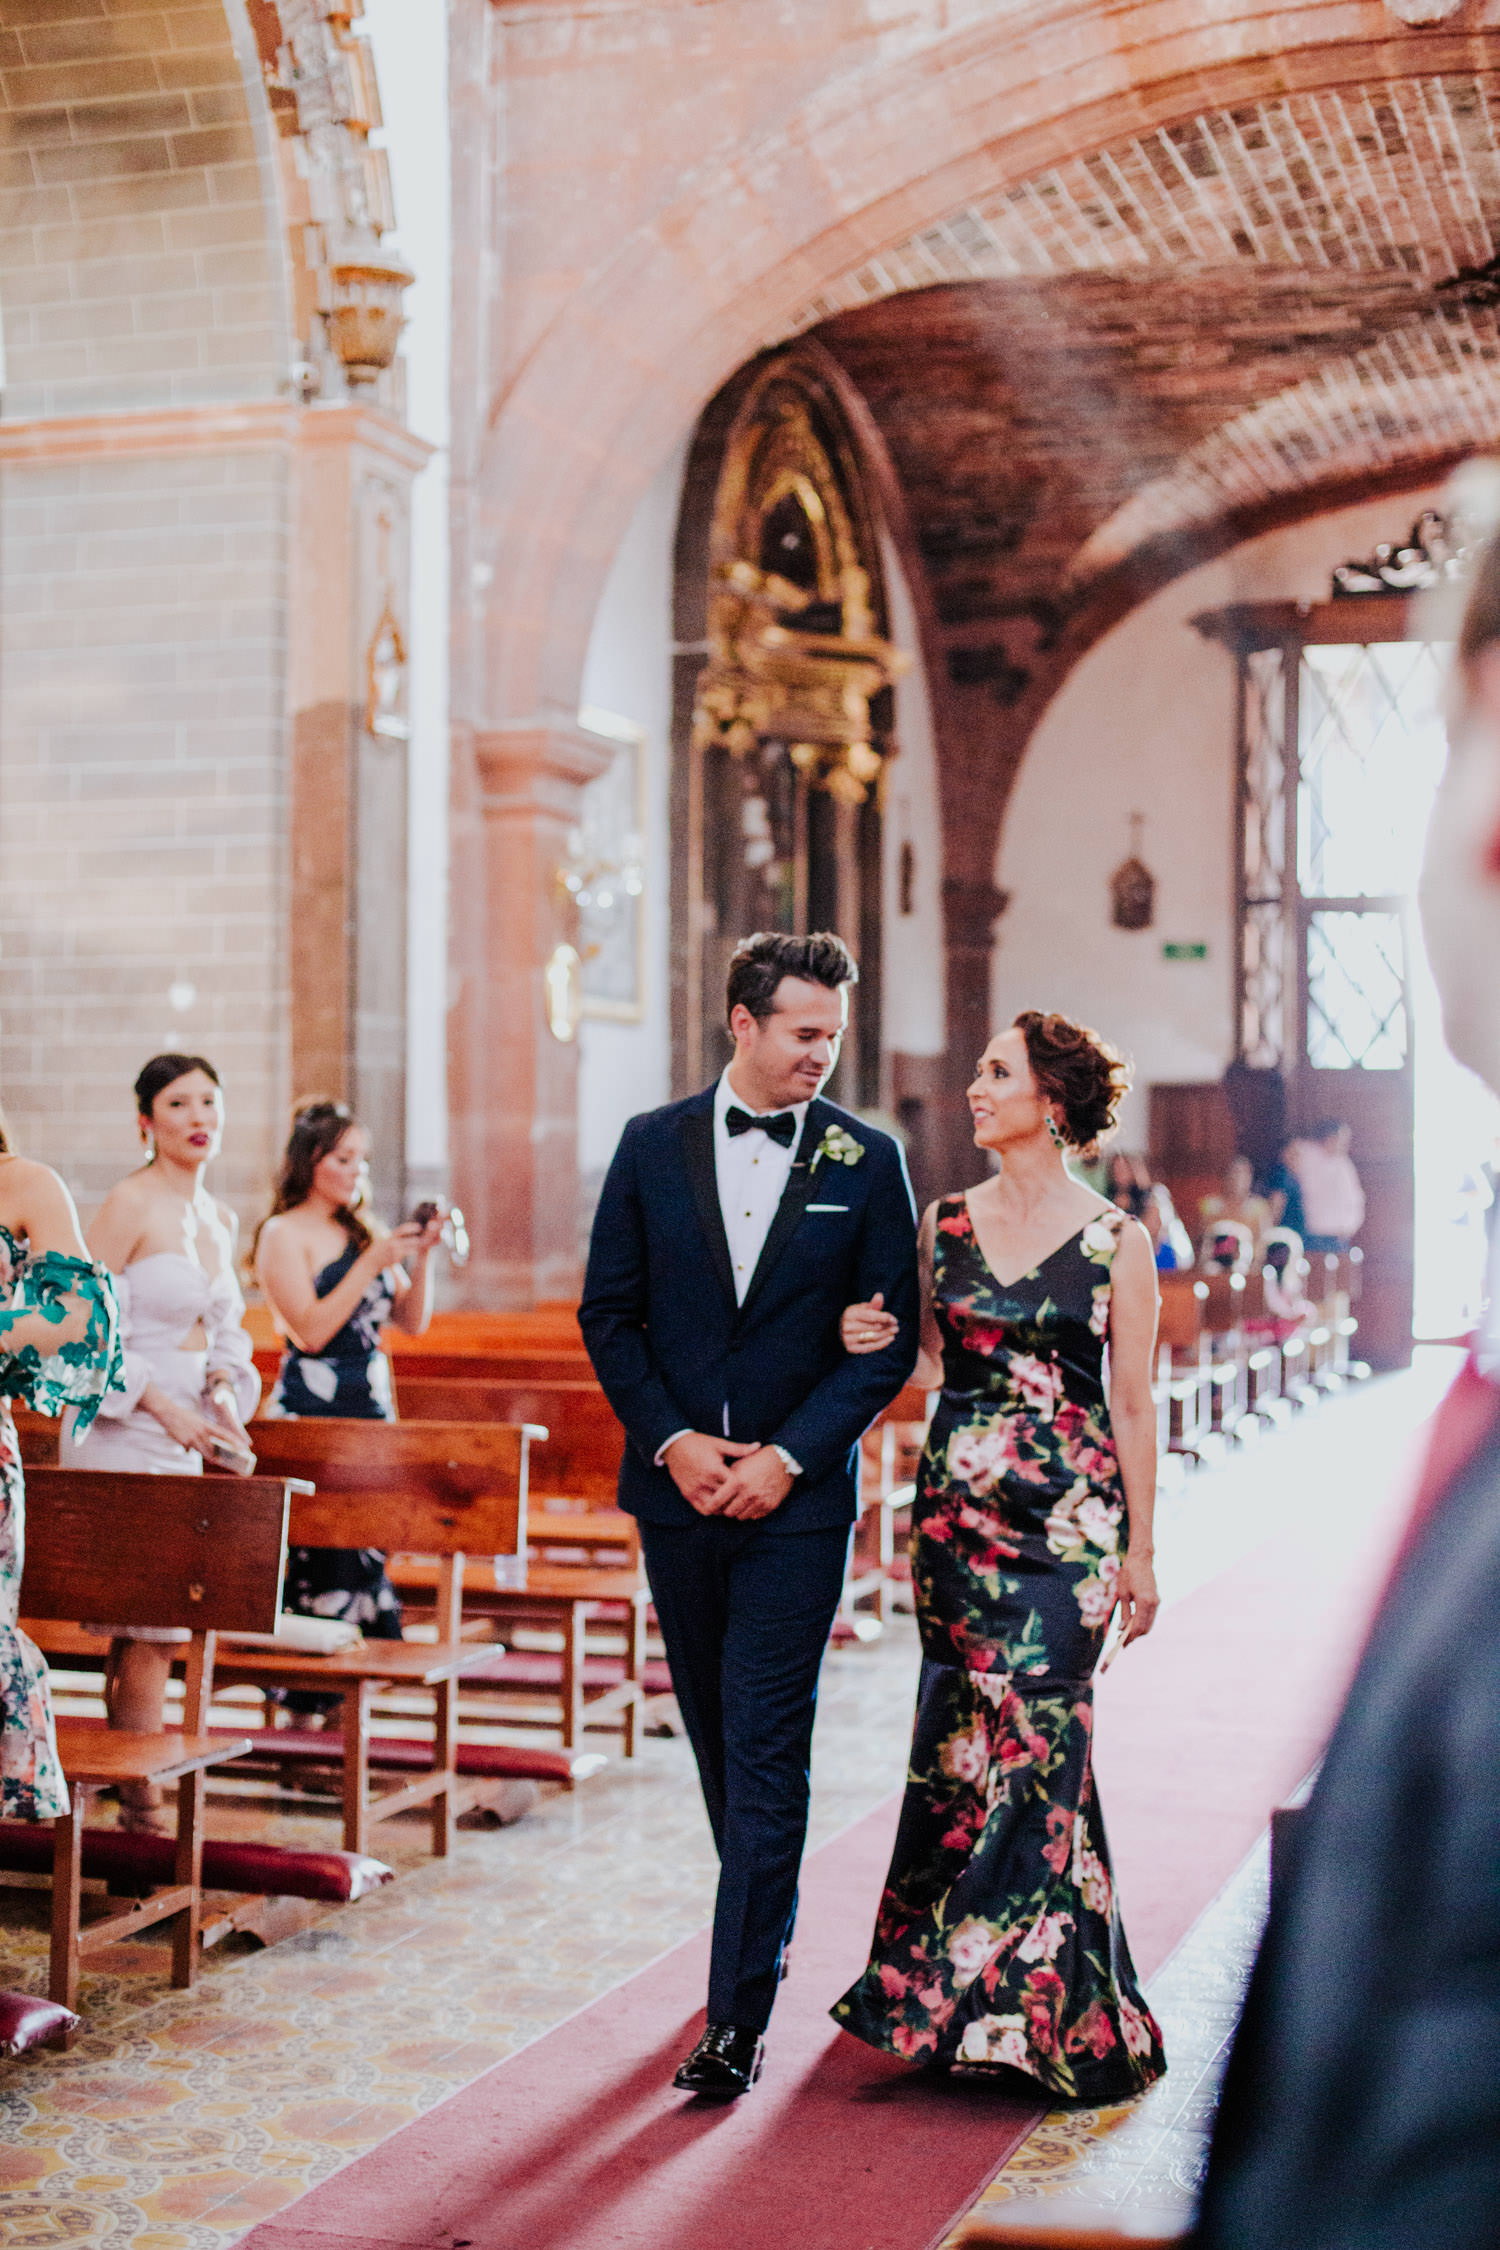 San-Miguel-de-Allende-Wedding-Photography-Parroquia-Instituto-Boda-Fotografia-Fer-Sergio-Pierce-Lifestyle-Photography0151.JPG